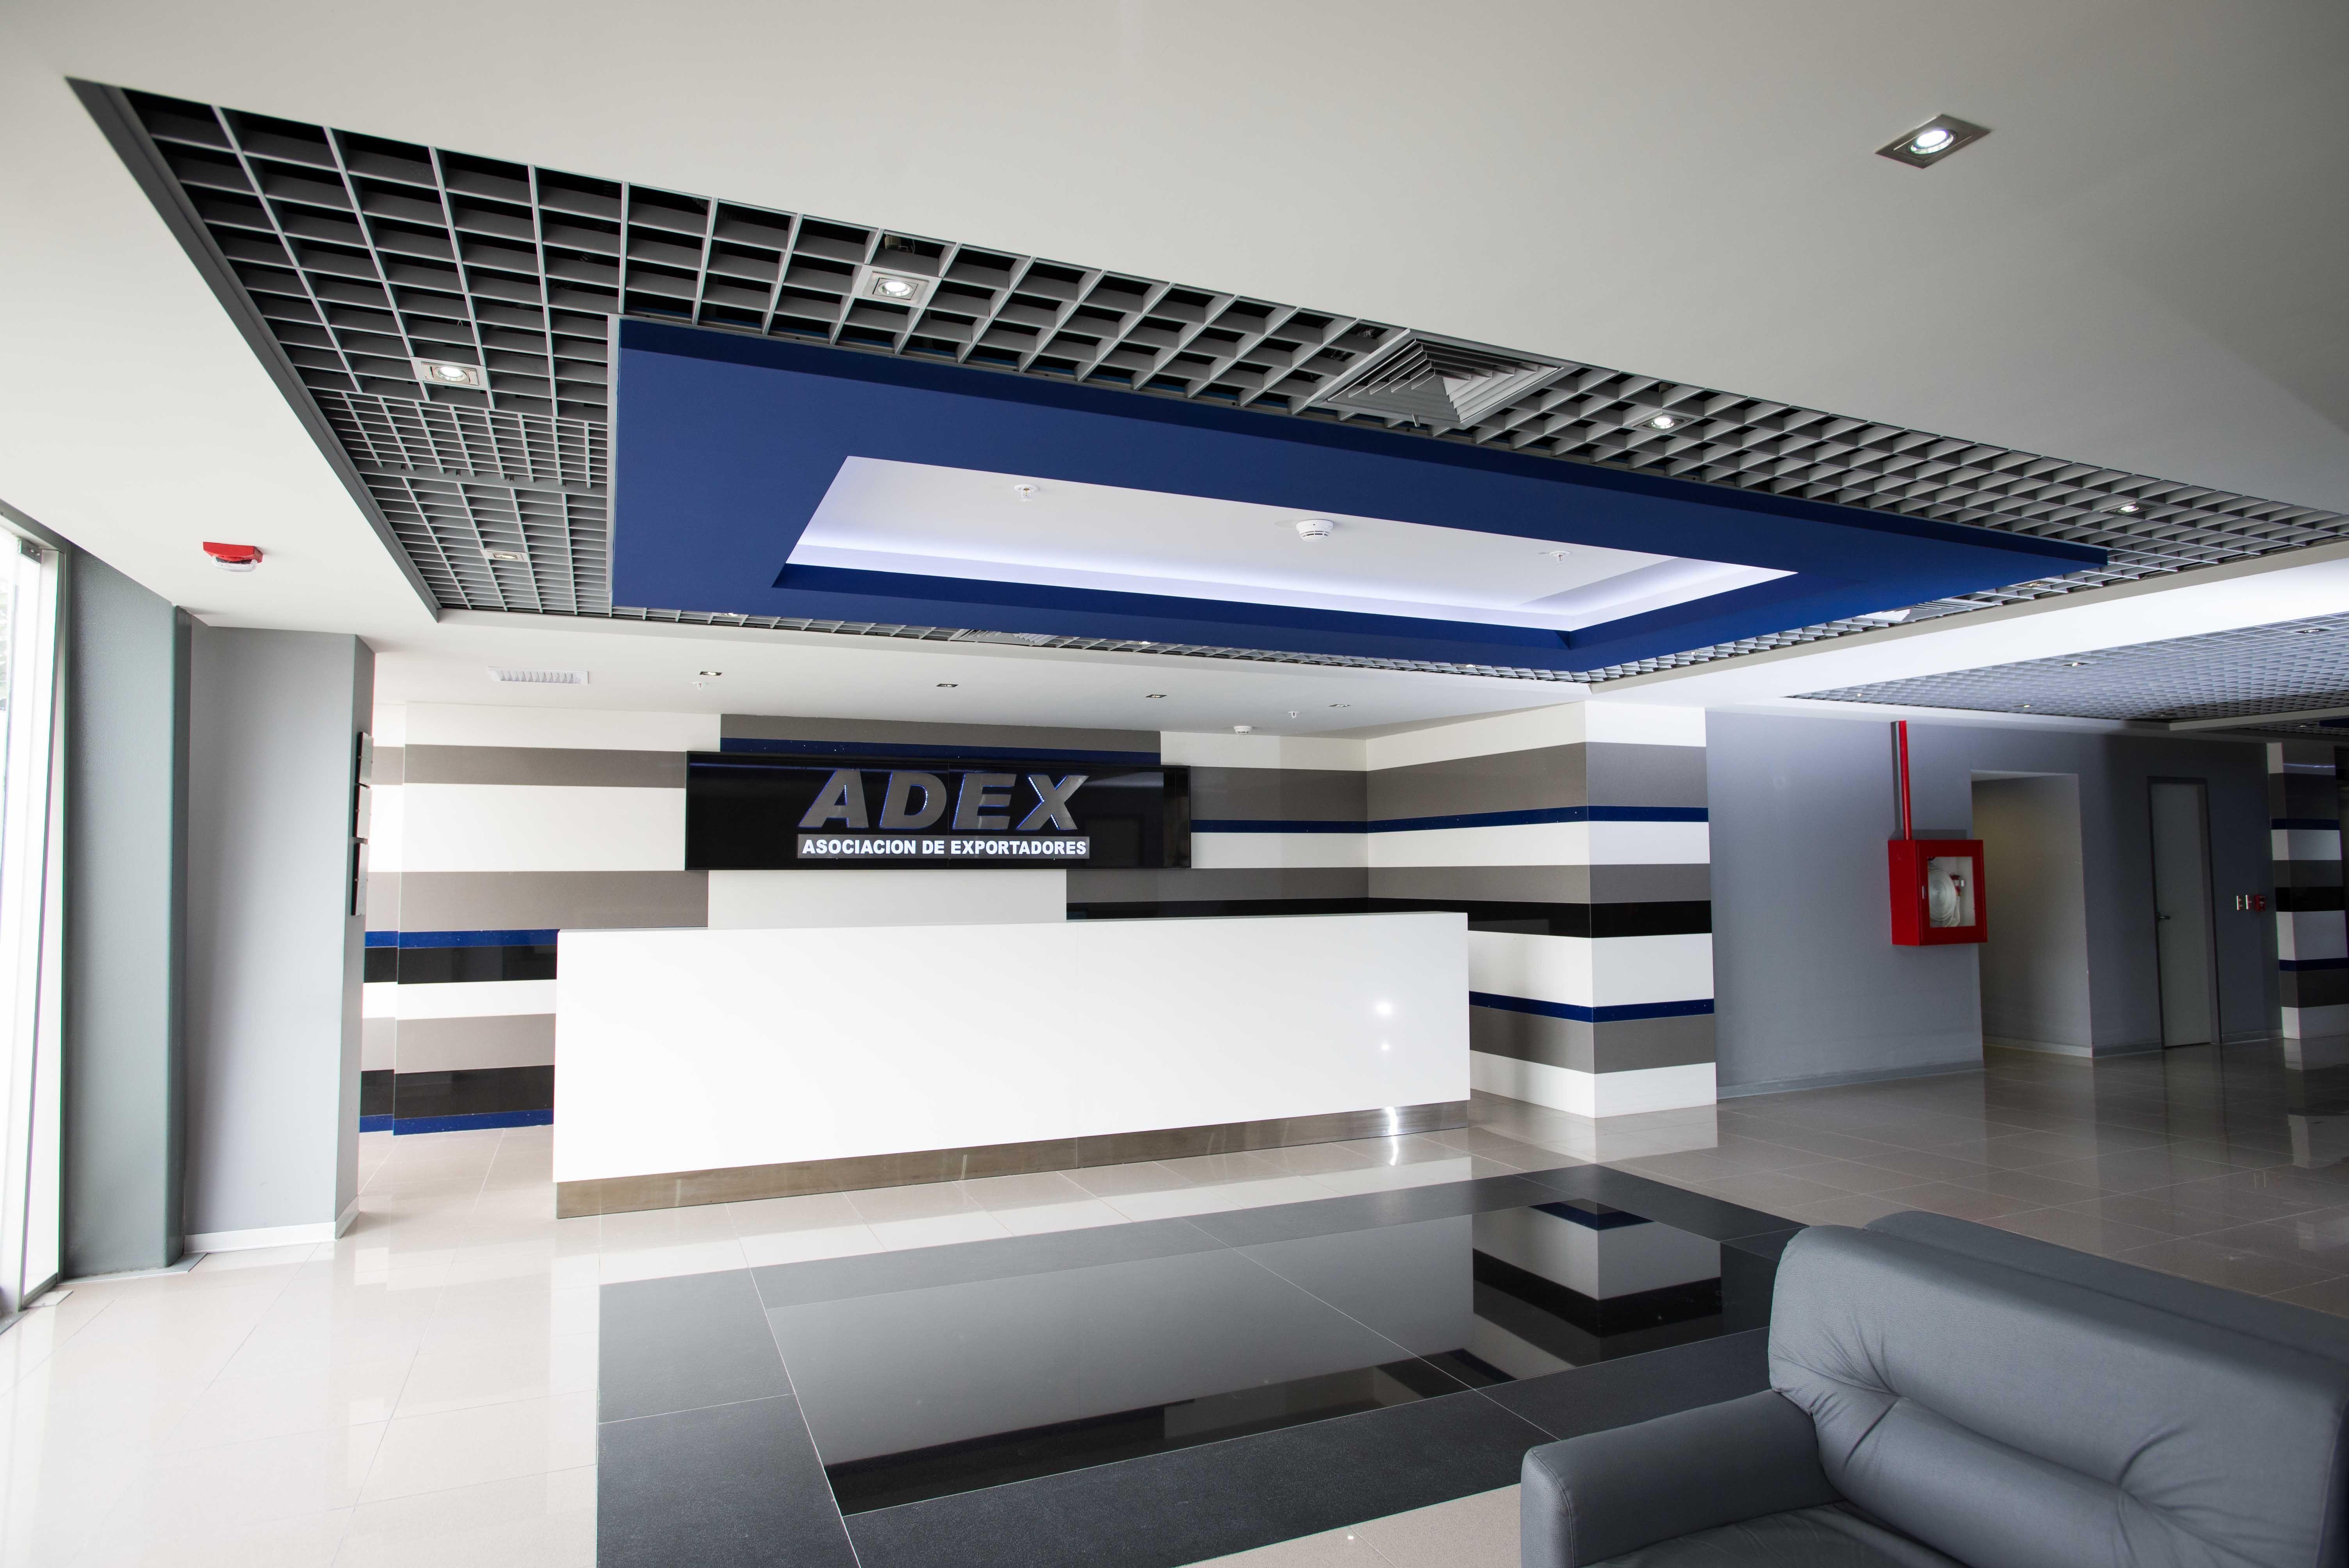 Proyecto de dise o interior de oficinas para adex ubicado for Diseno de interiores lima